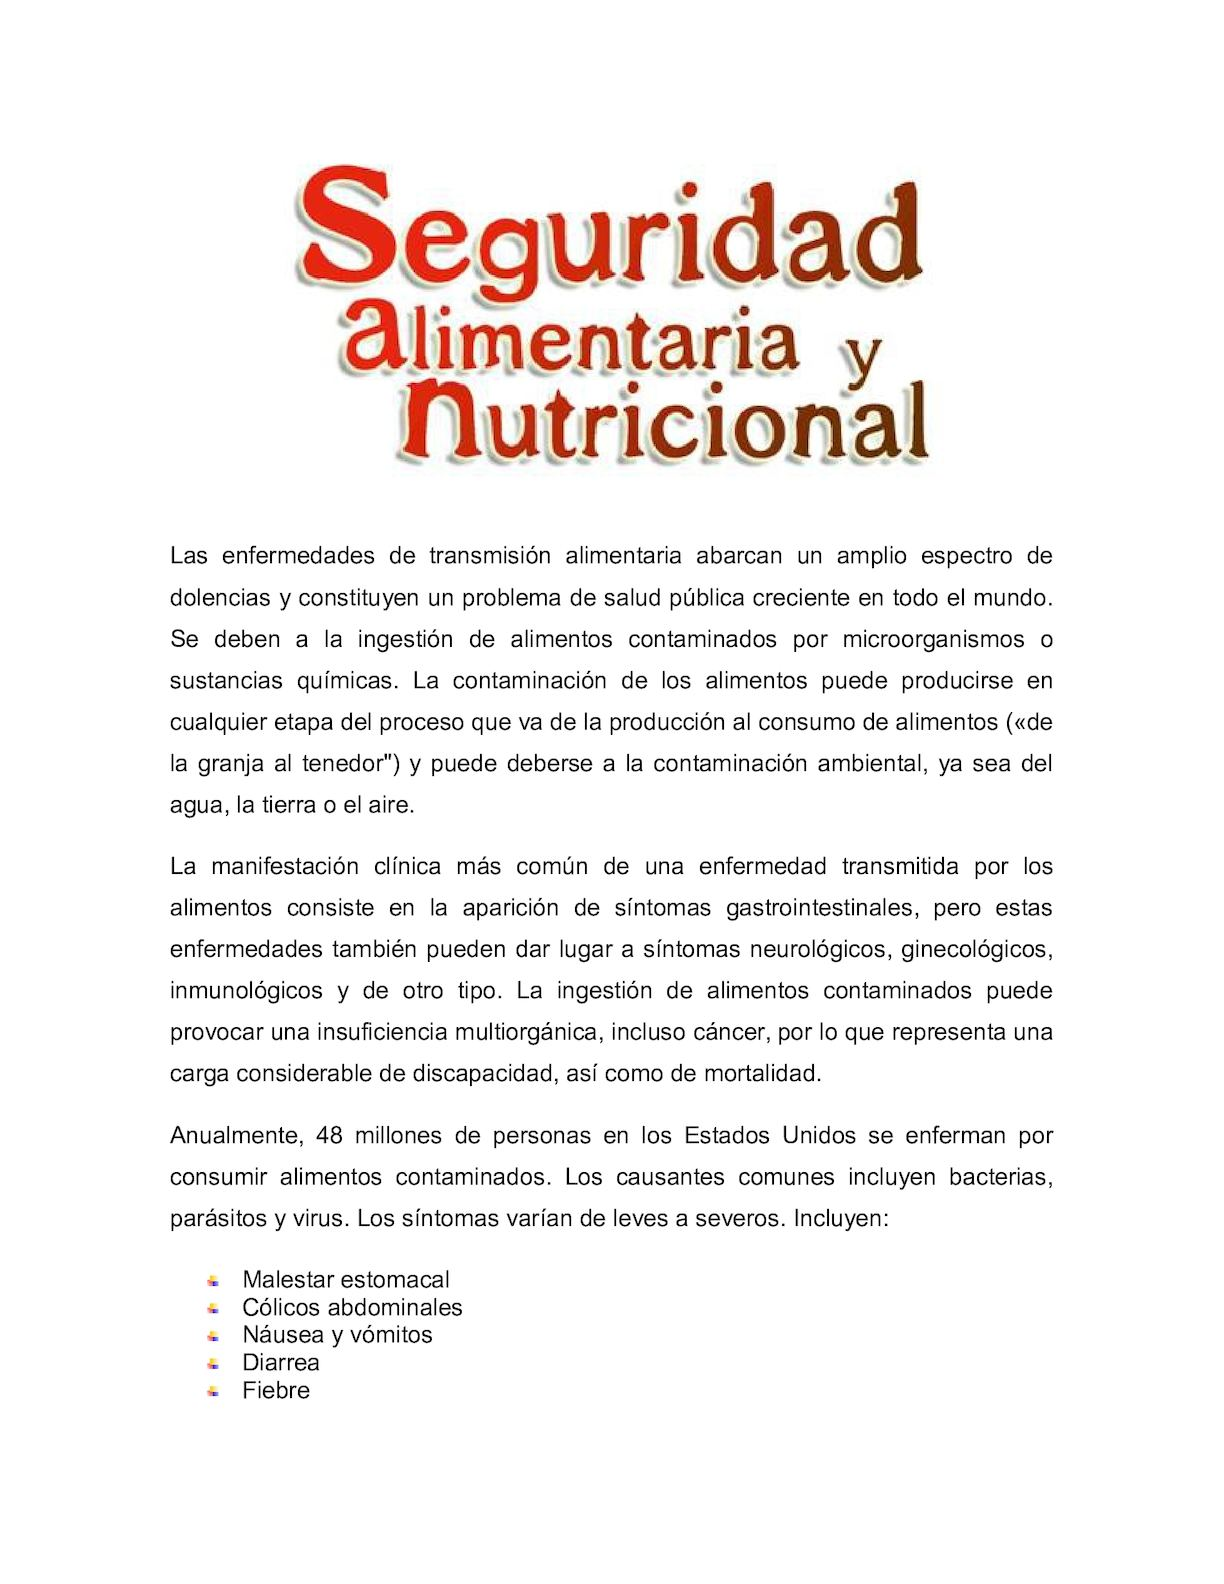 tipos de enfermedades por transmision alimentaria